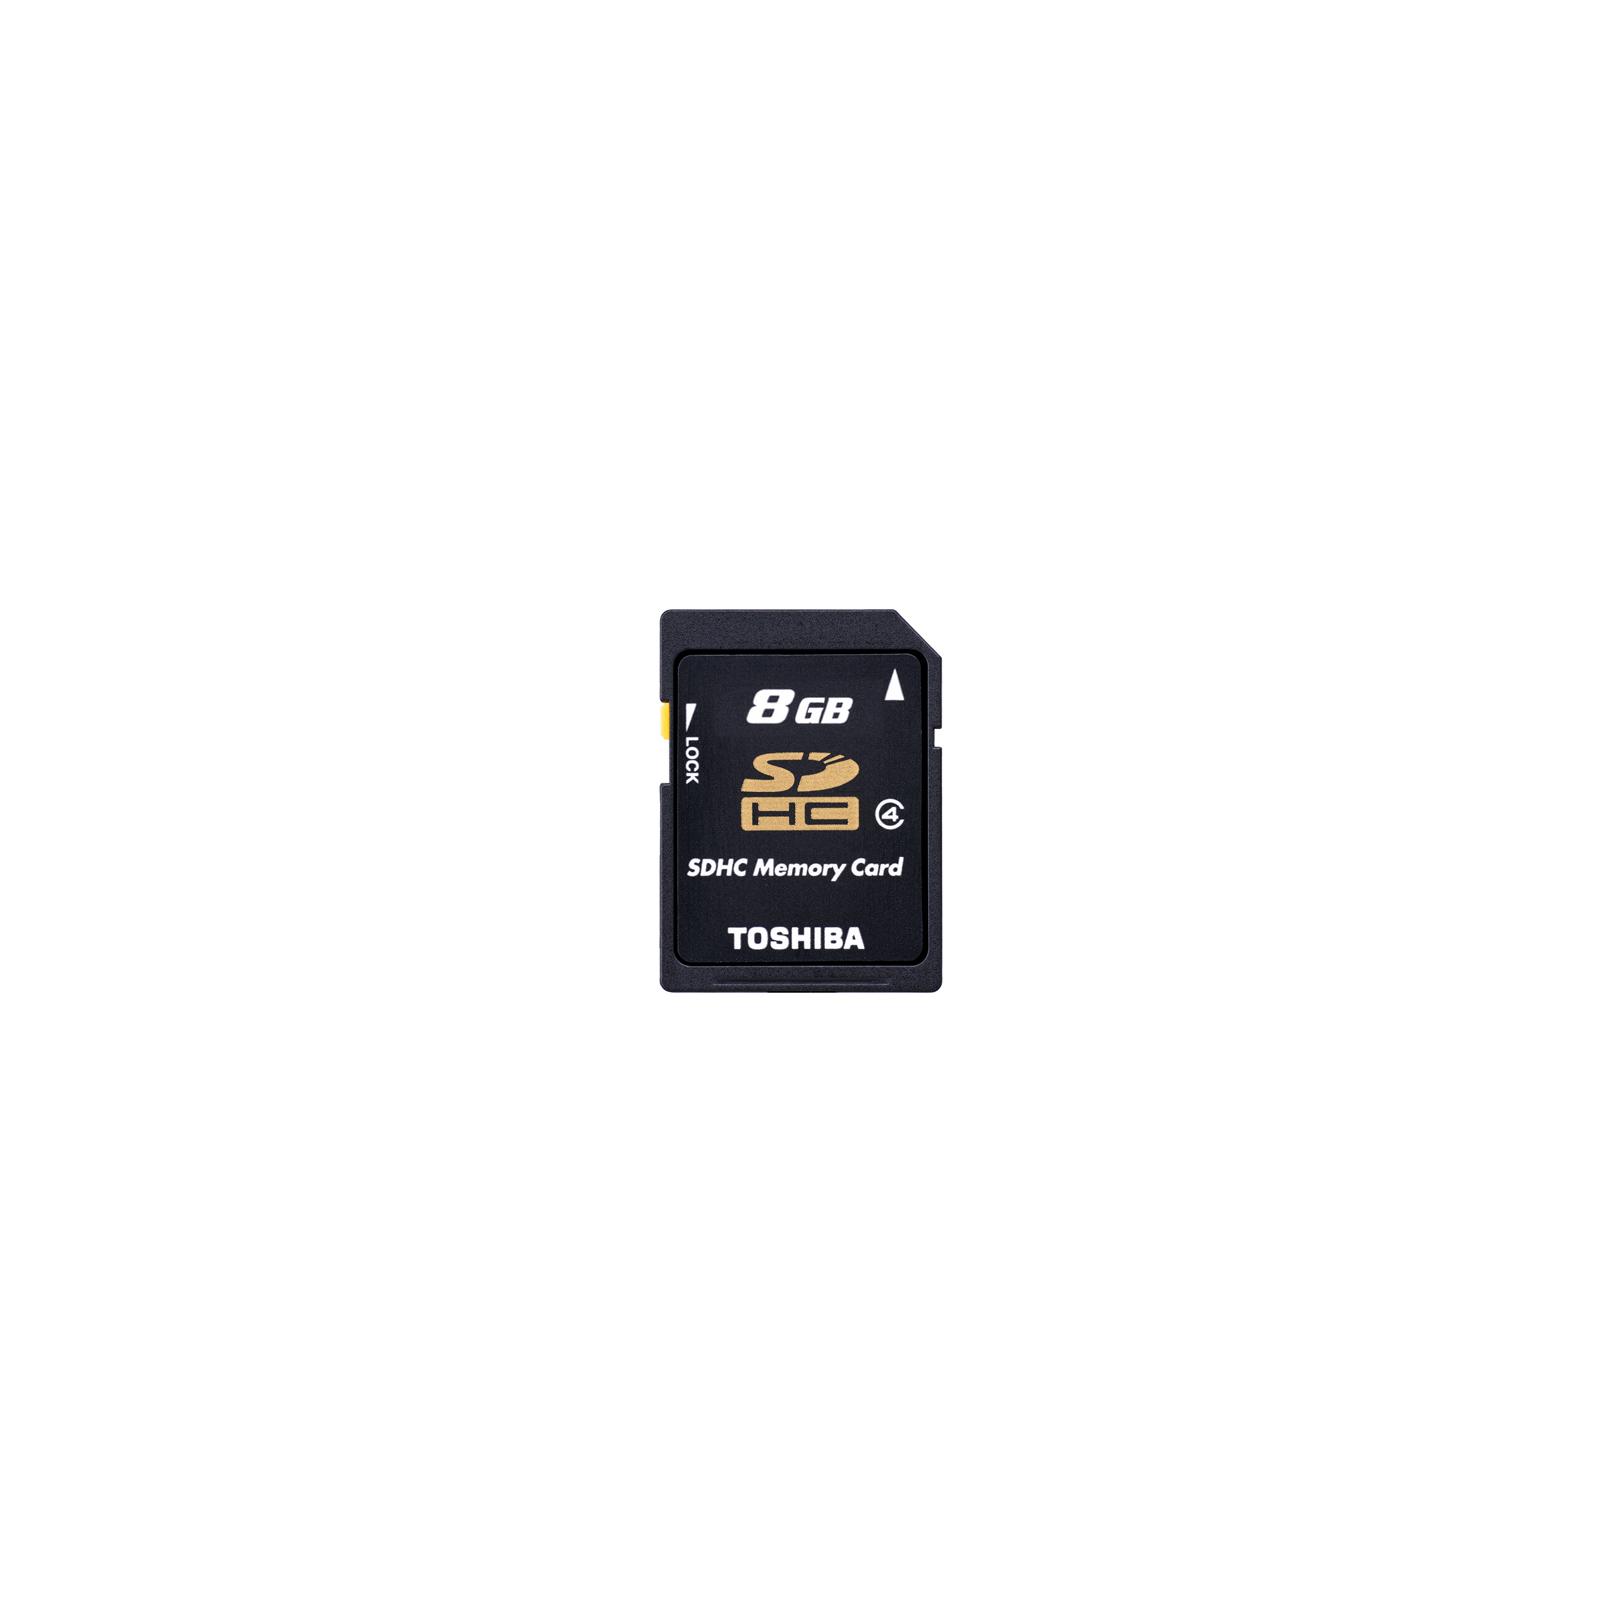 Карта памяти TOSHIBA 8Gb SDHC class 4 (SD-K08GJ(BL5)